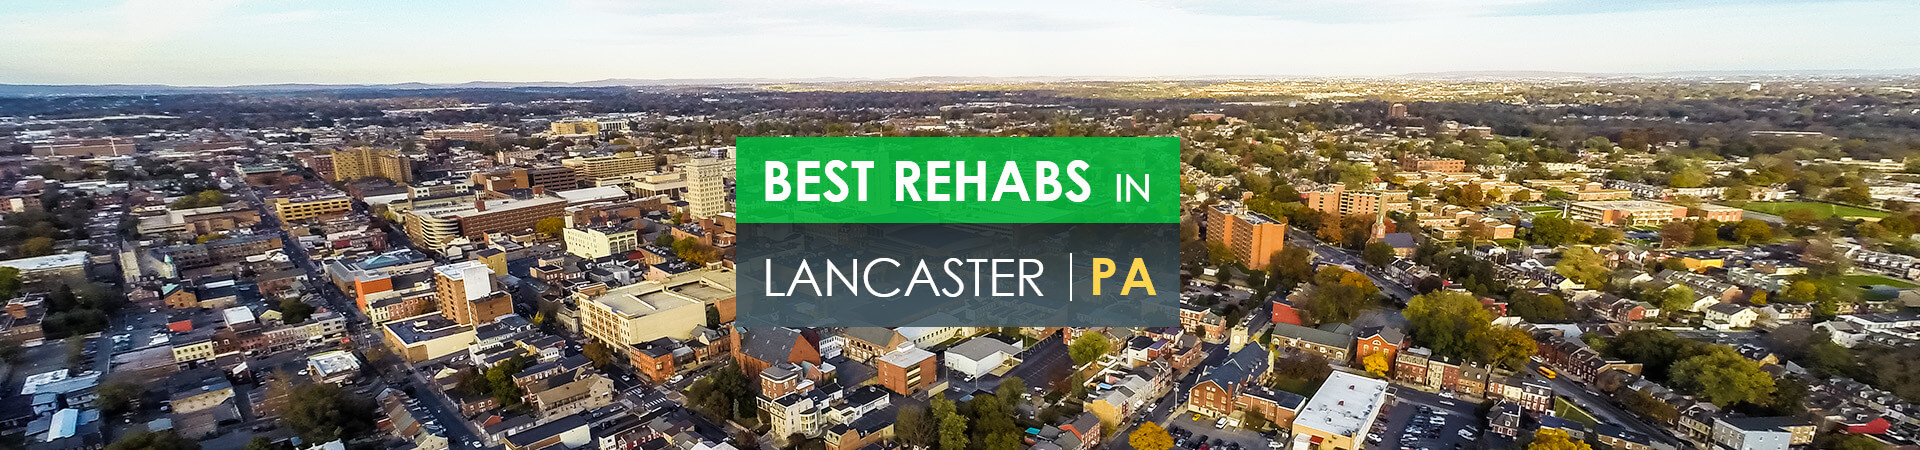 Best rehabs in Lancaster, PA